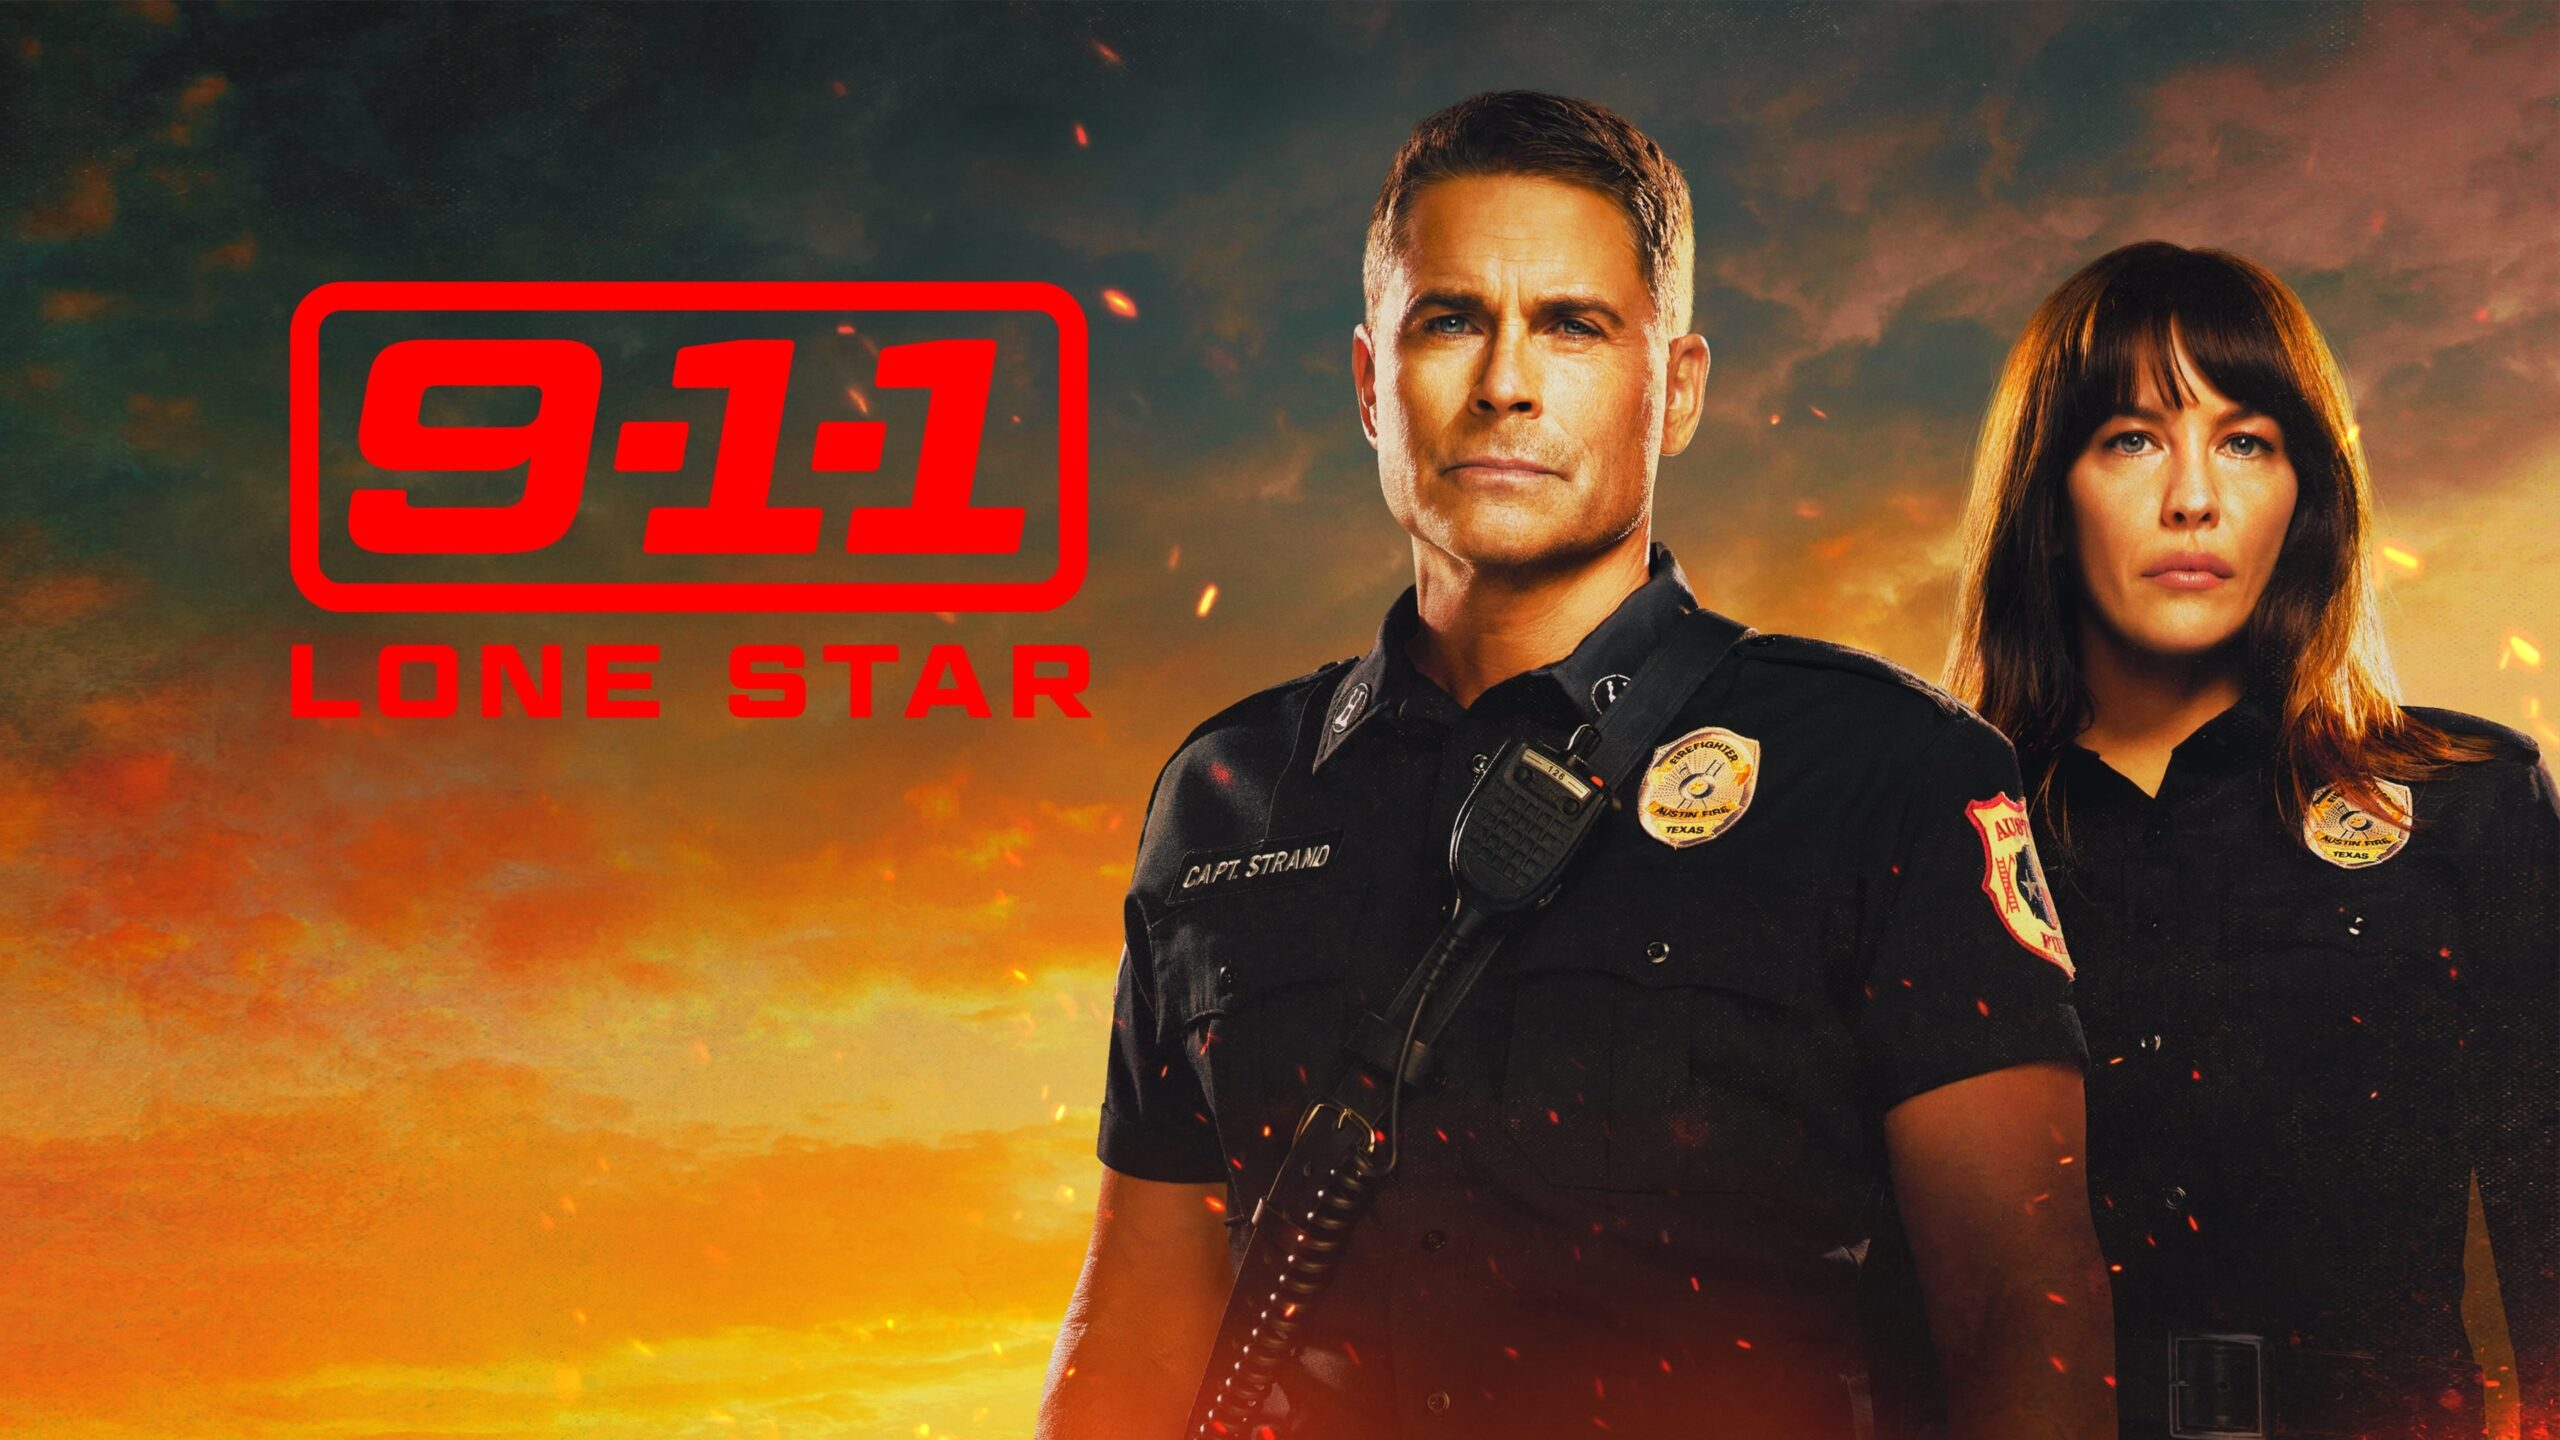 9-1-1: Lone Star Season 2 Episode 4